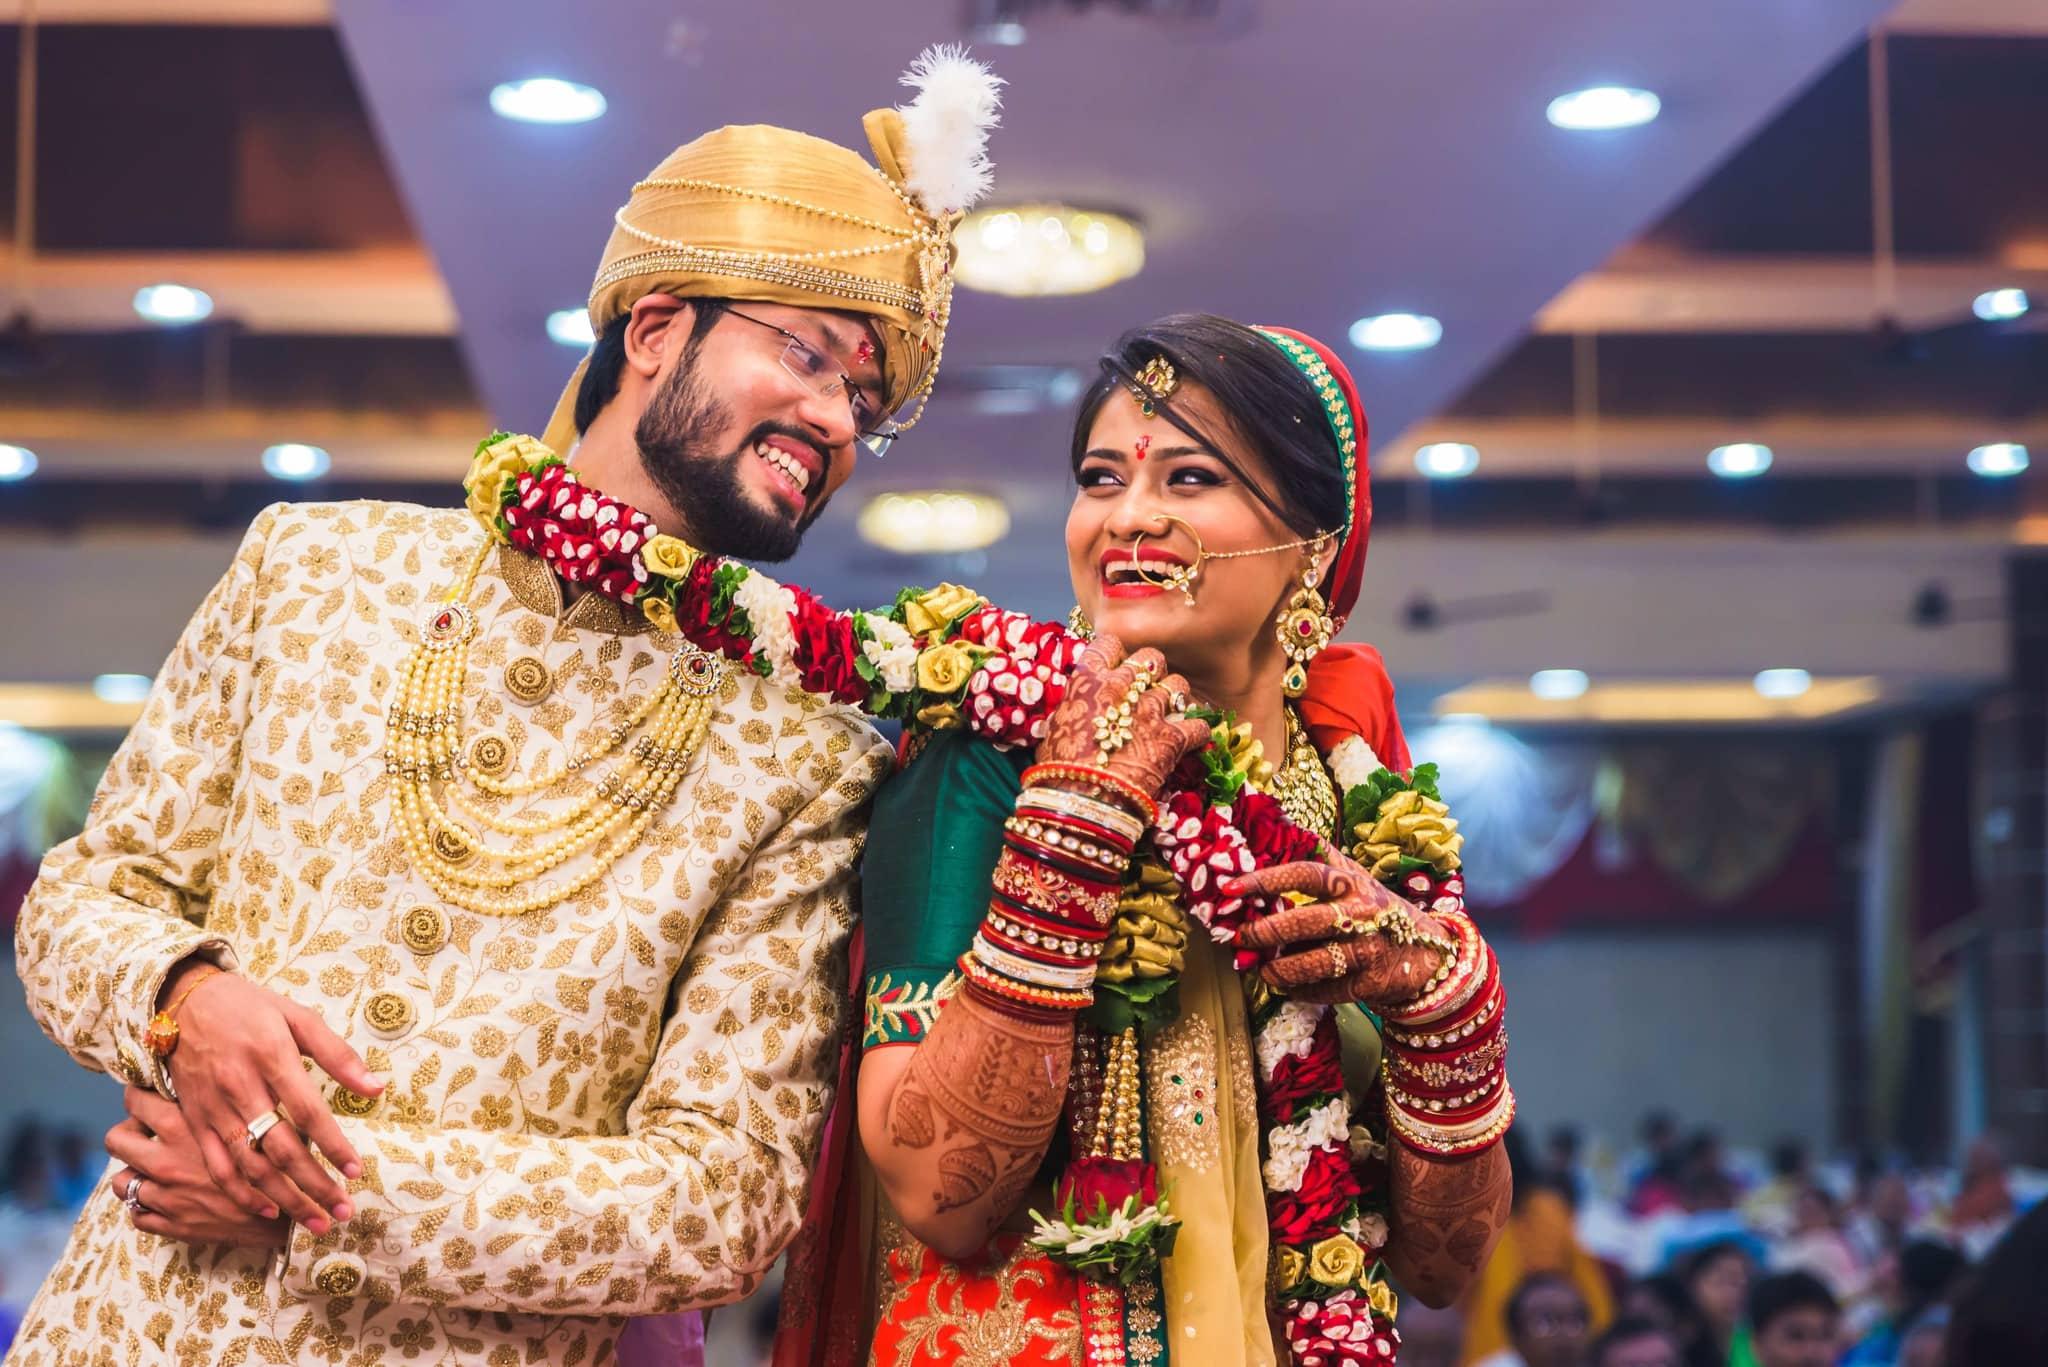 Ushma Akash Married